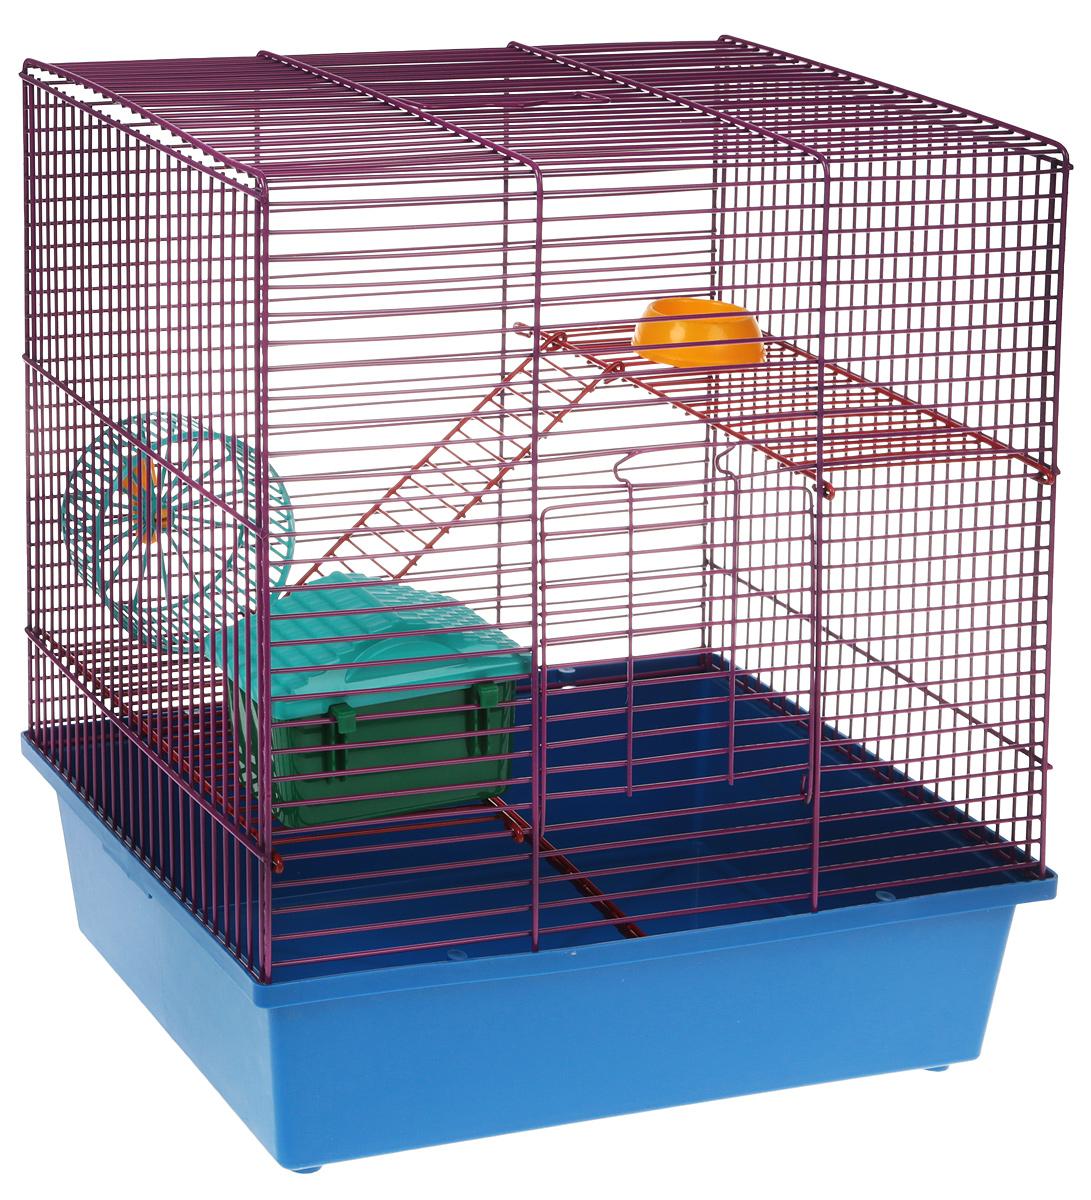 Клетка для грызунов Велес Lusy Hamster-3к, 3-этажная, цвет: синий, фиолетовый, 35 х 26 х 40 см клетка для грызунов велес lusy hamster 2 2 этажная цвет синий бирюзовый 35 х 26 х 26 см